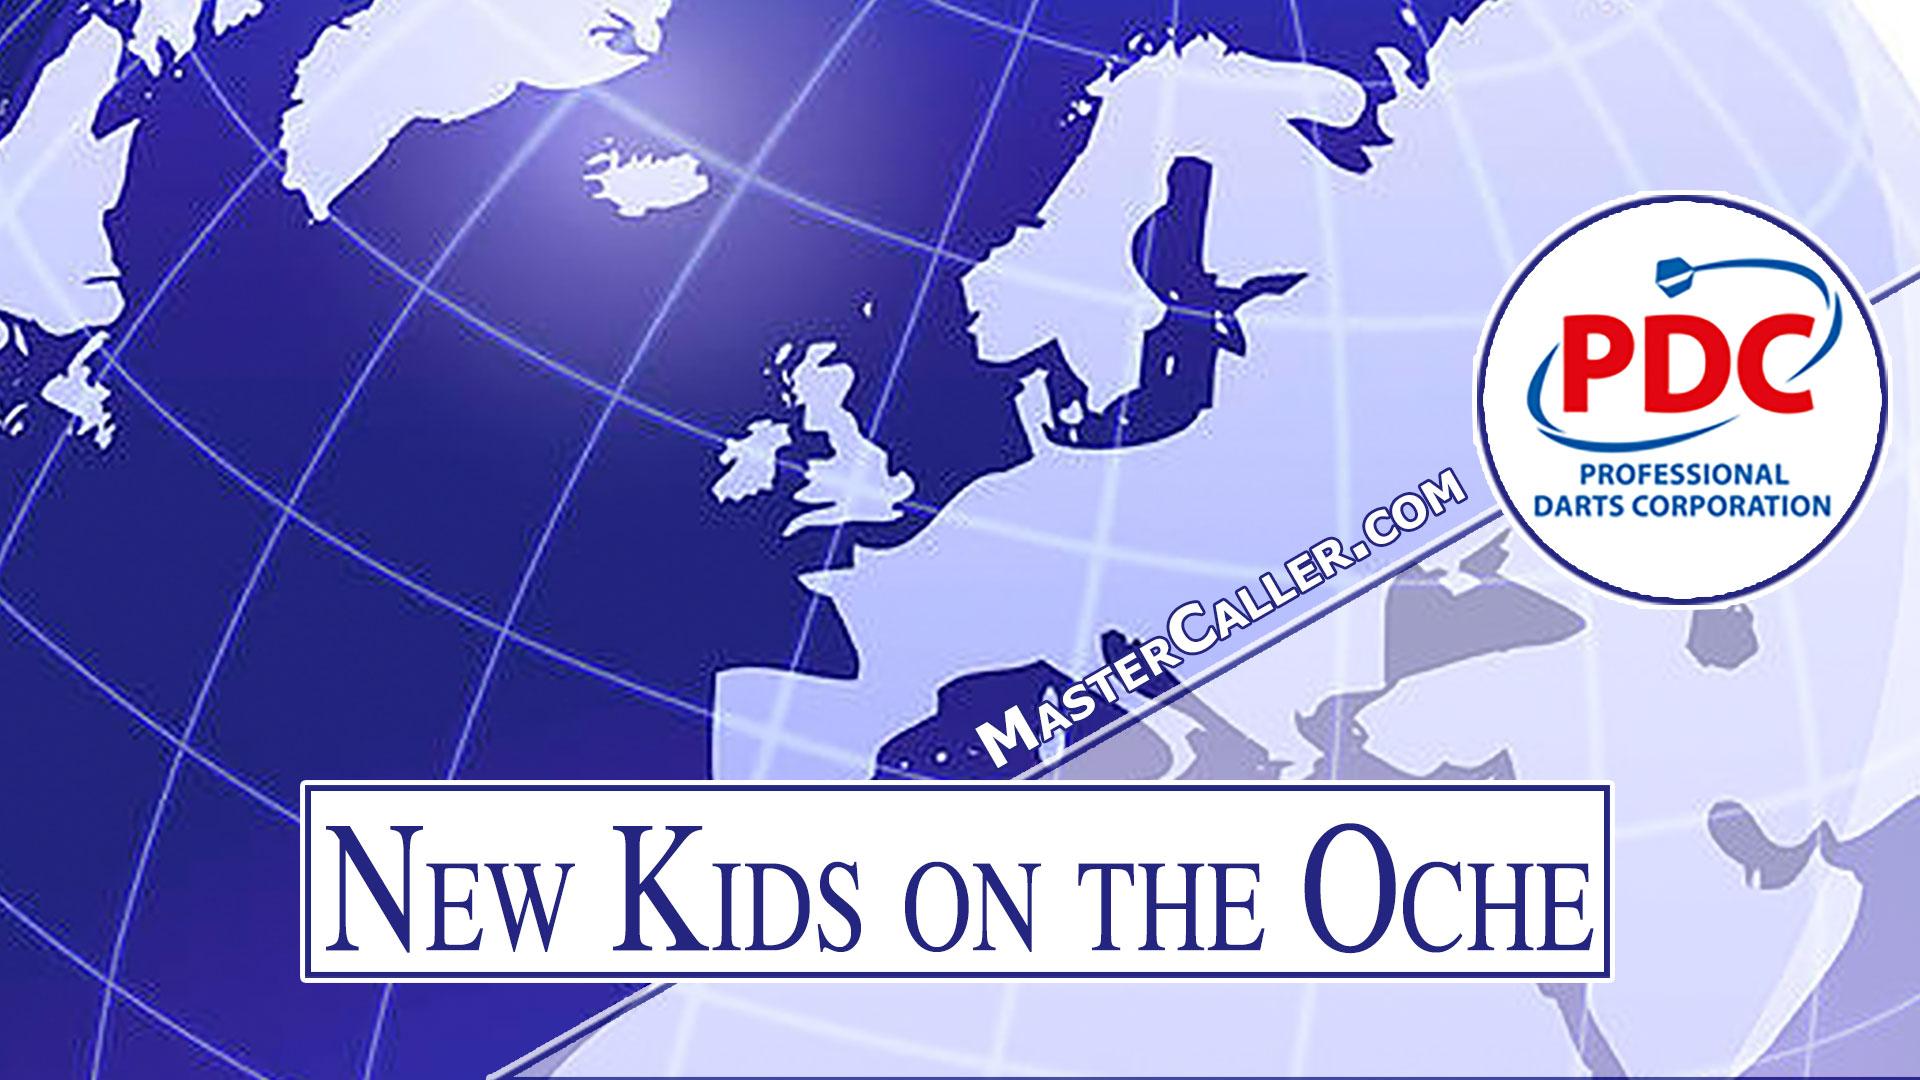 New Kids on the Oche - 2008 Logo